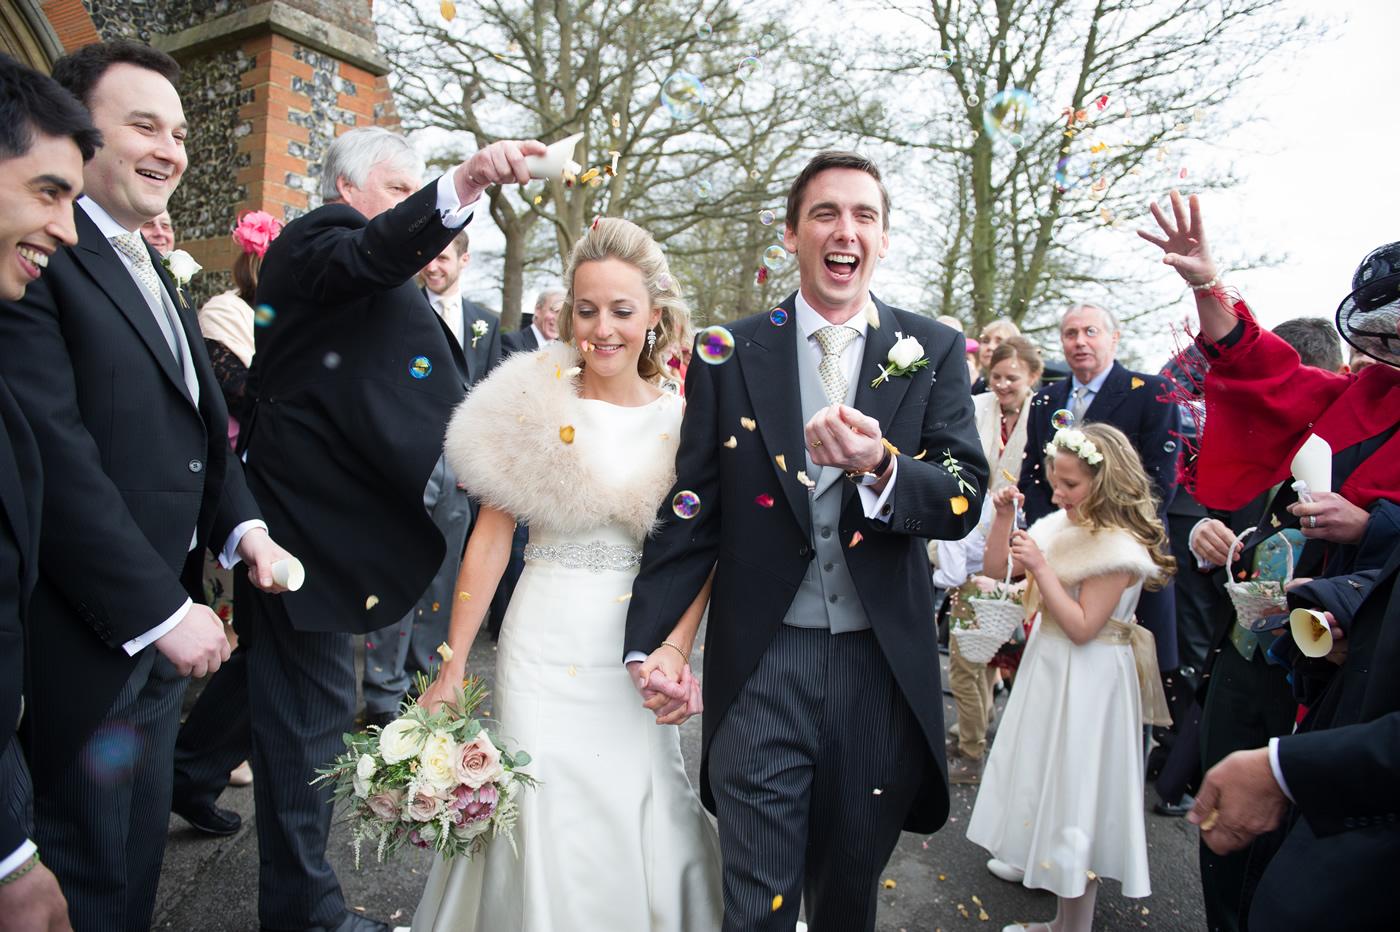 Just Married - Biride & Bride Leave Church - Weddings at Bradfield College Berkshire - Bridal Hair & Makeup by Anabela of Maidenhead